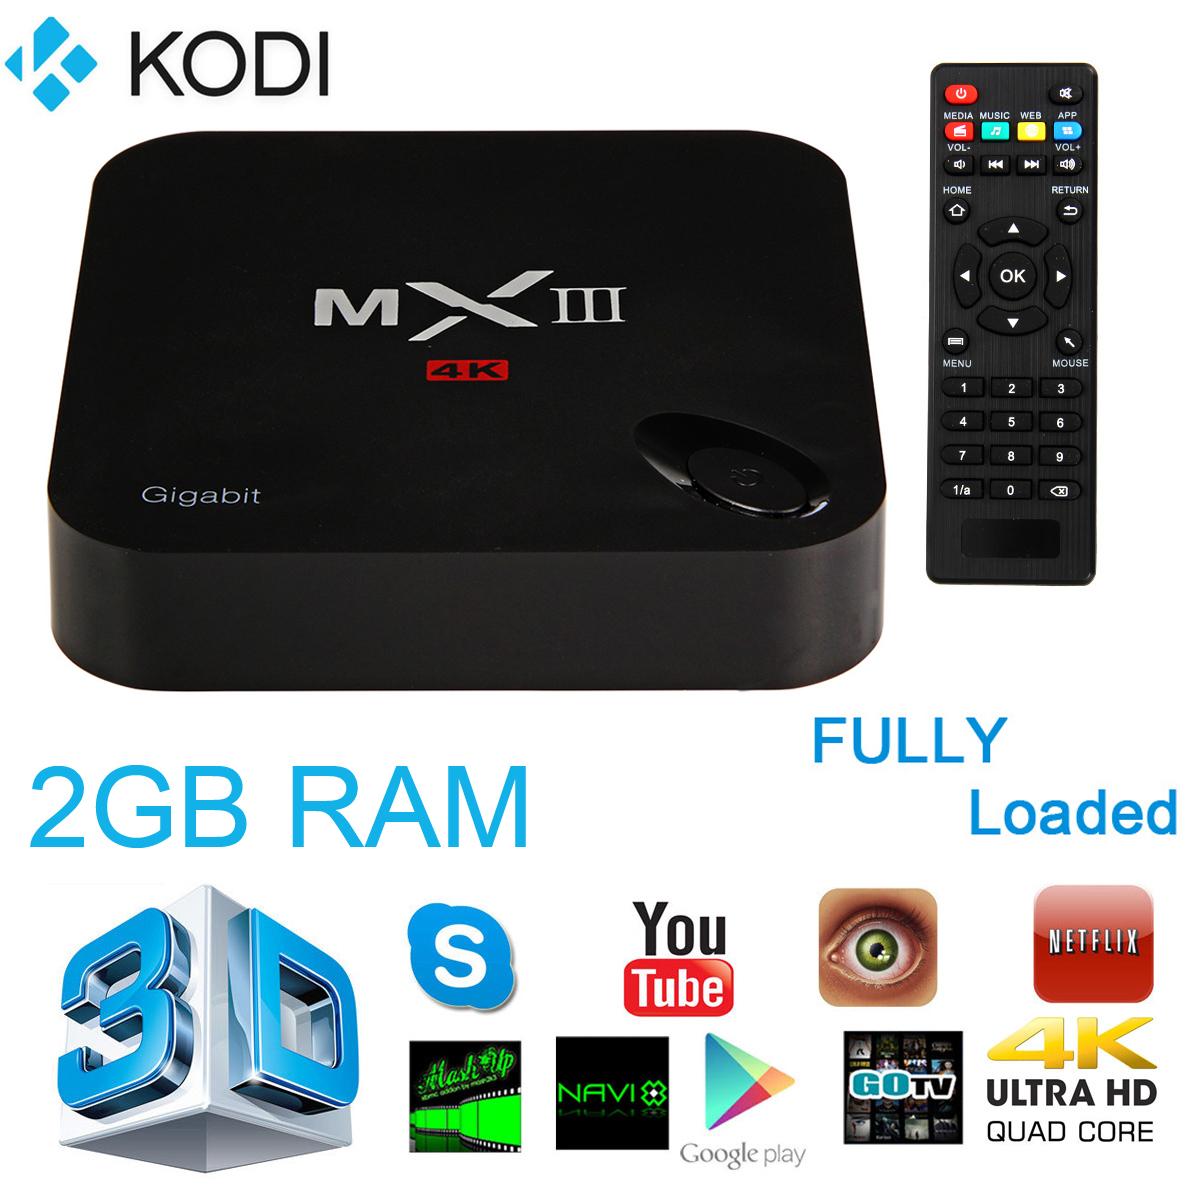 MXIII-G Quad Core HD FULLY LOADED Android 5.1 TV Box WiFi+KODI 15.2 (XBMC) AH115(China (Mainland))